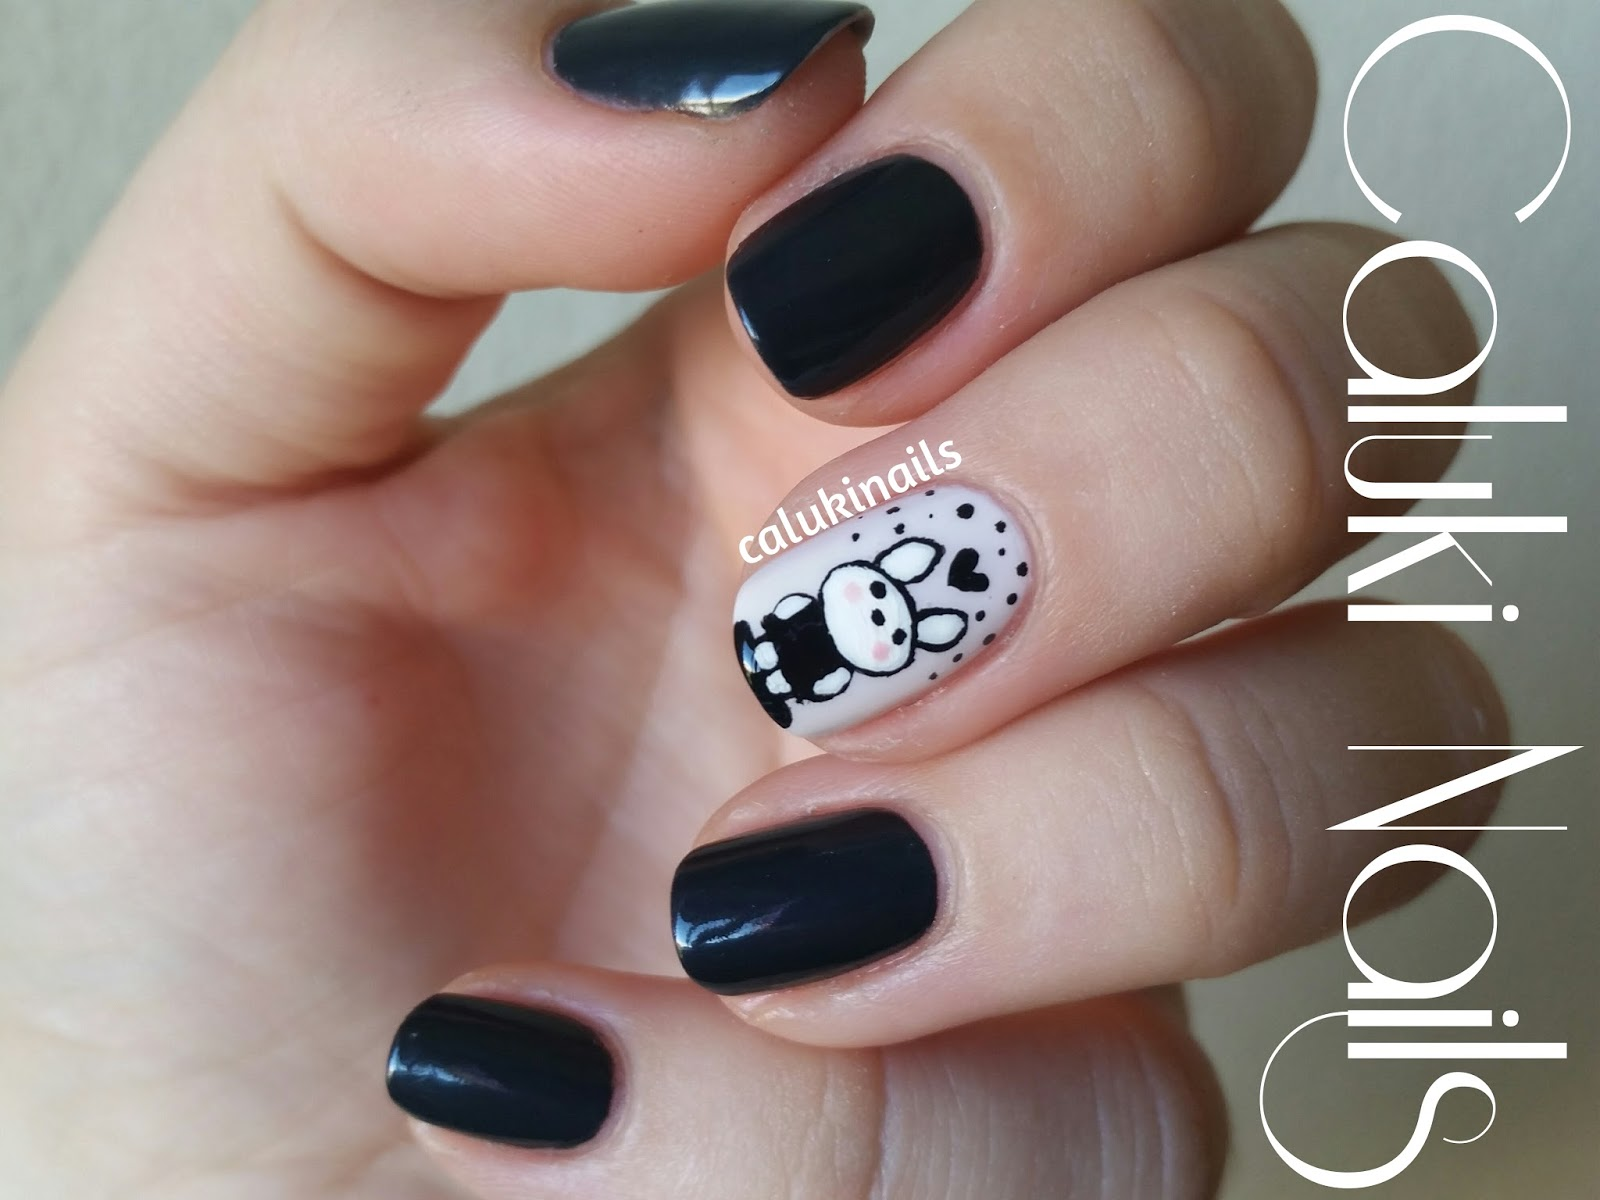 Caluki Nails Nail Art Conejito Liquorice De Isadora